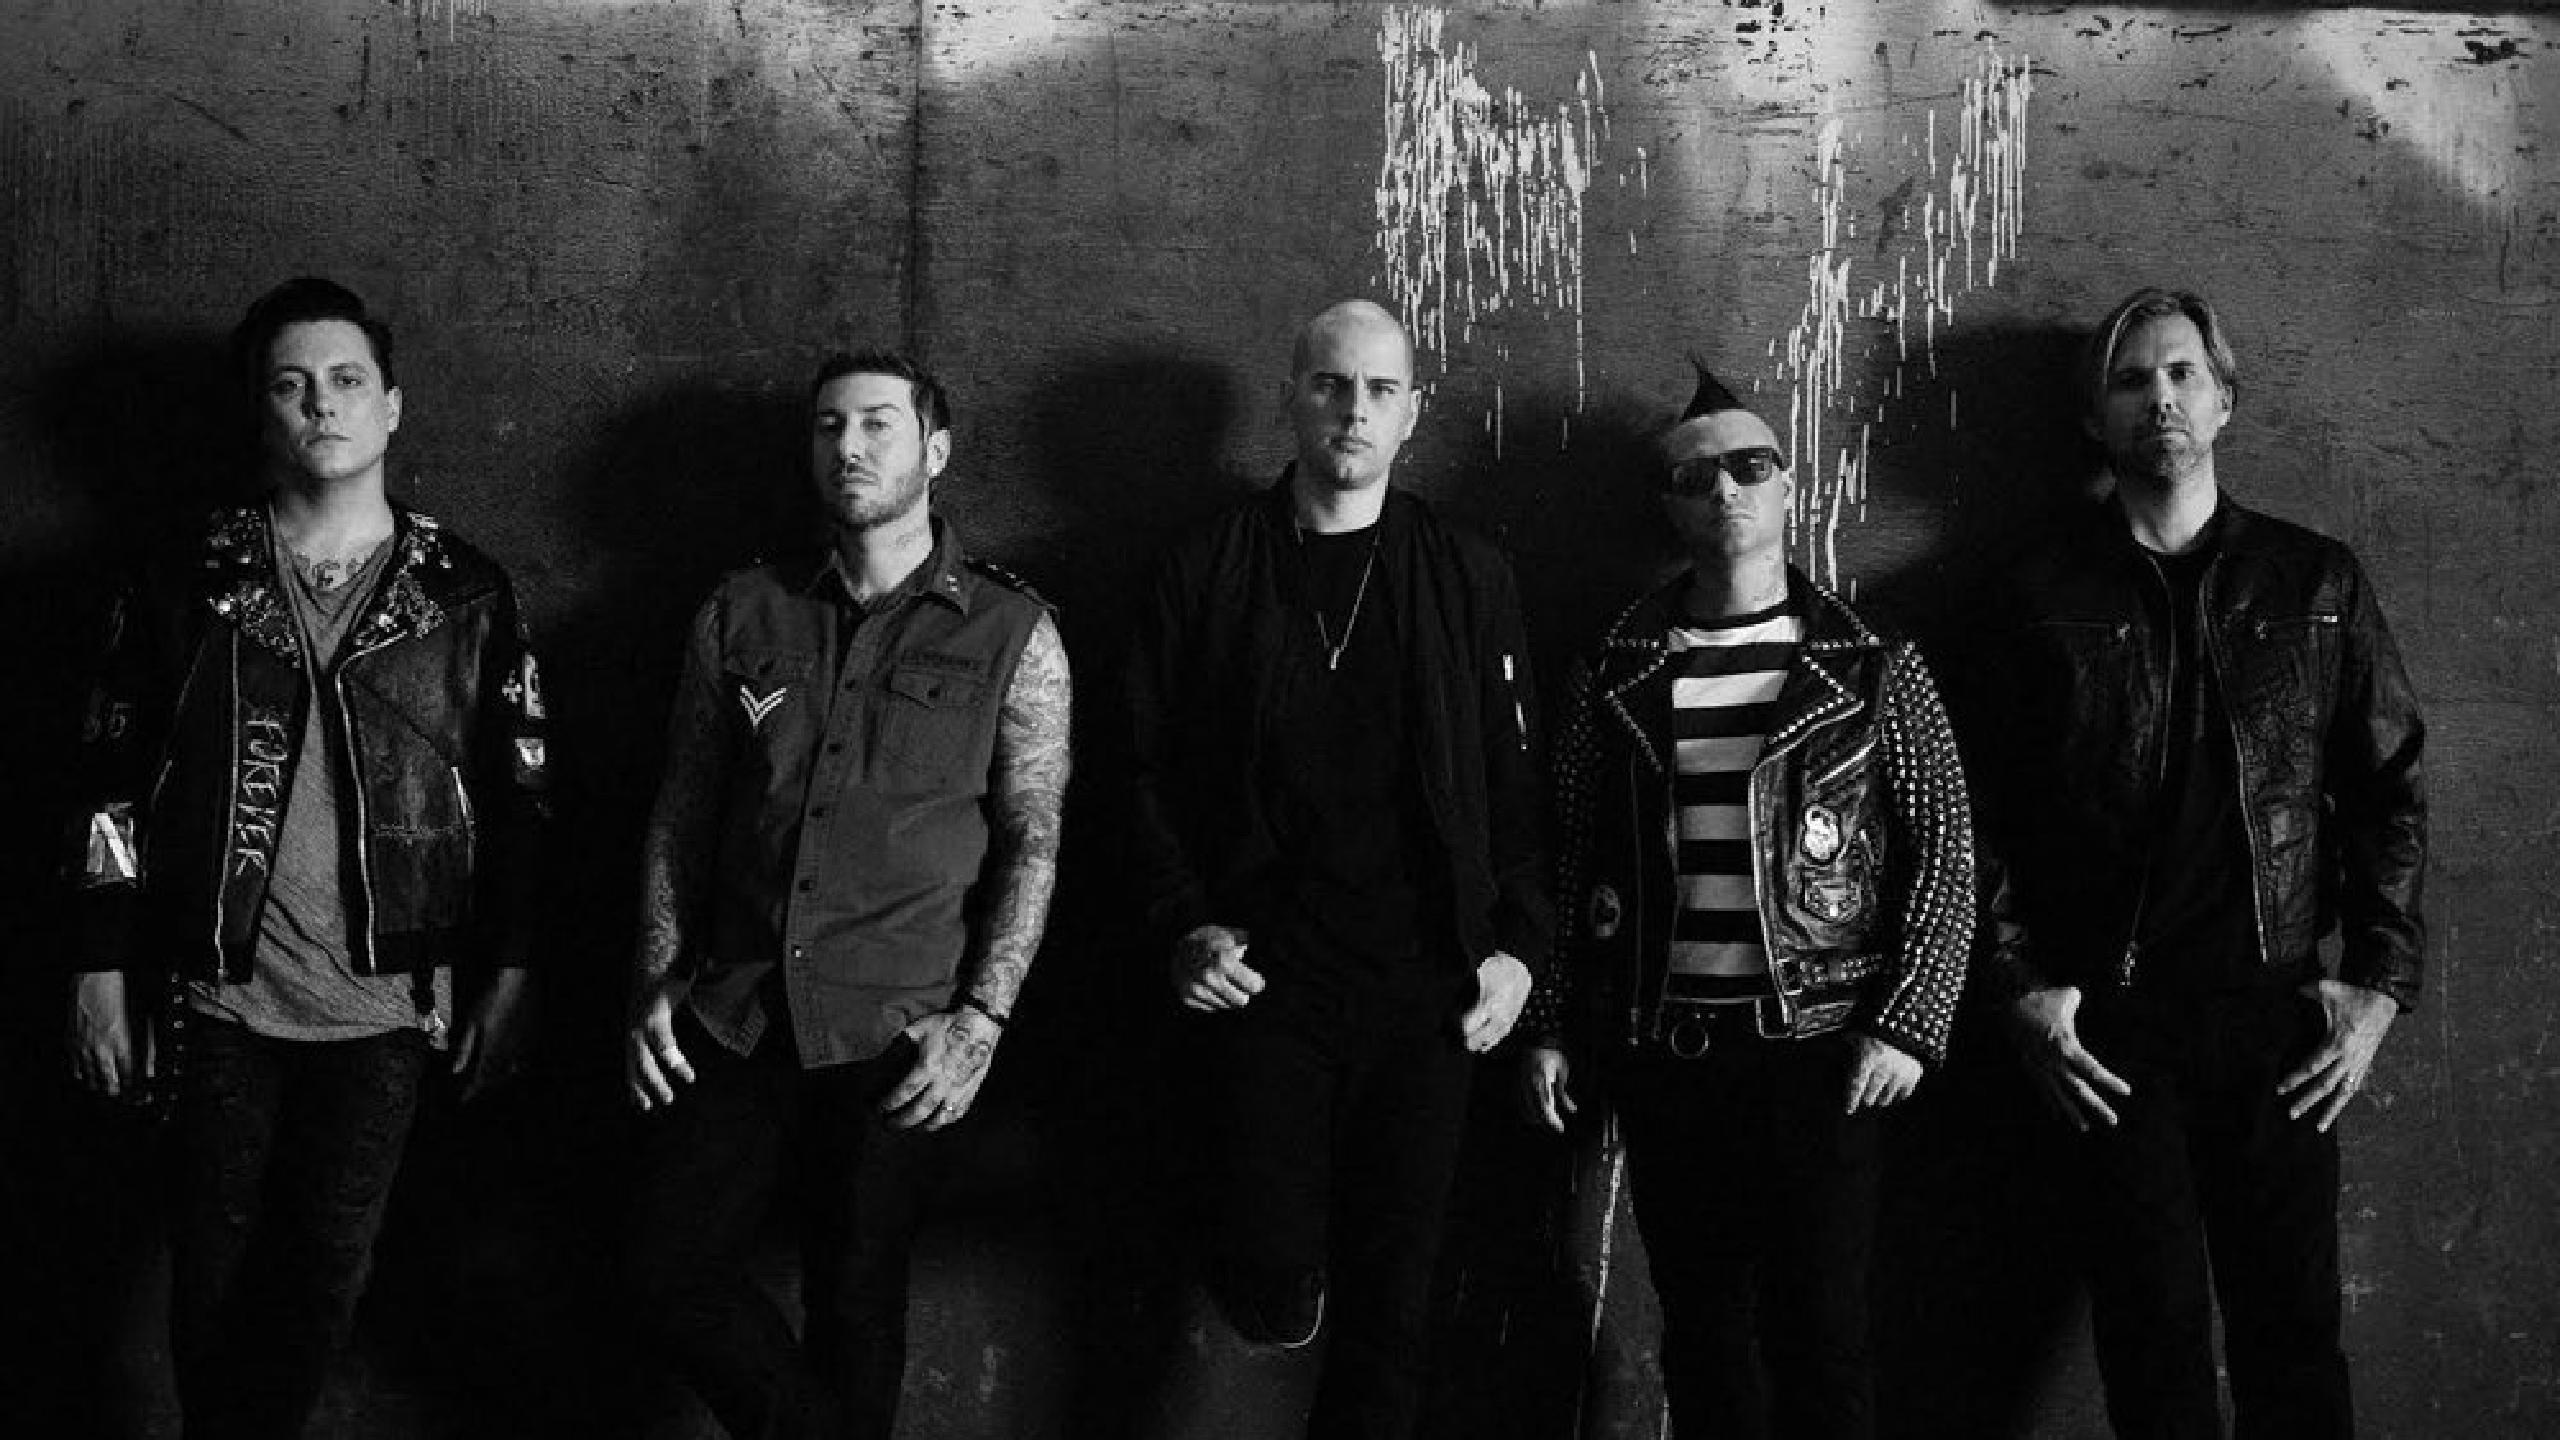 Avenged Sevenfold Tour 2020.Avenged Sevenfold Tour Dates 2019 2020 Avenged Sevenfold